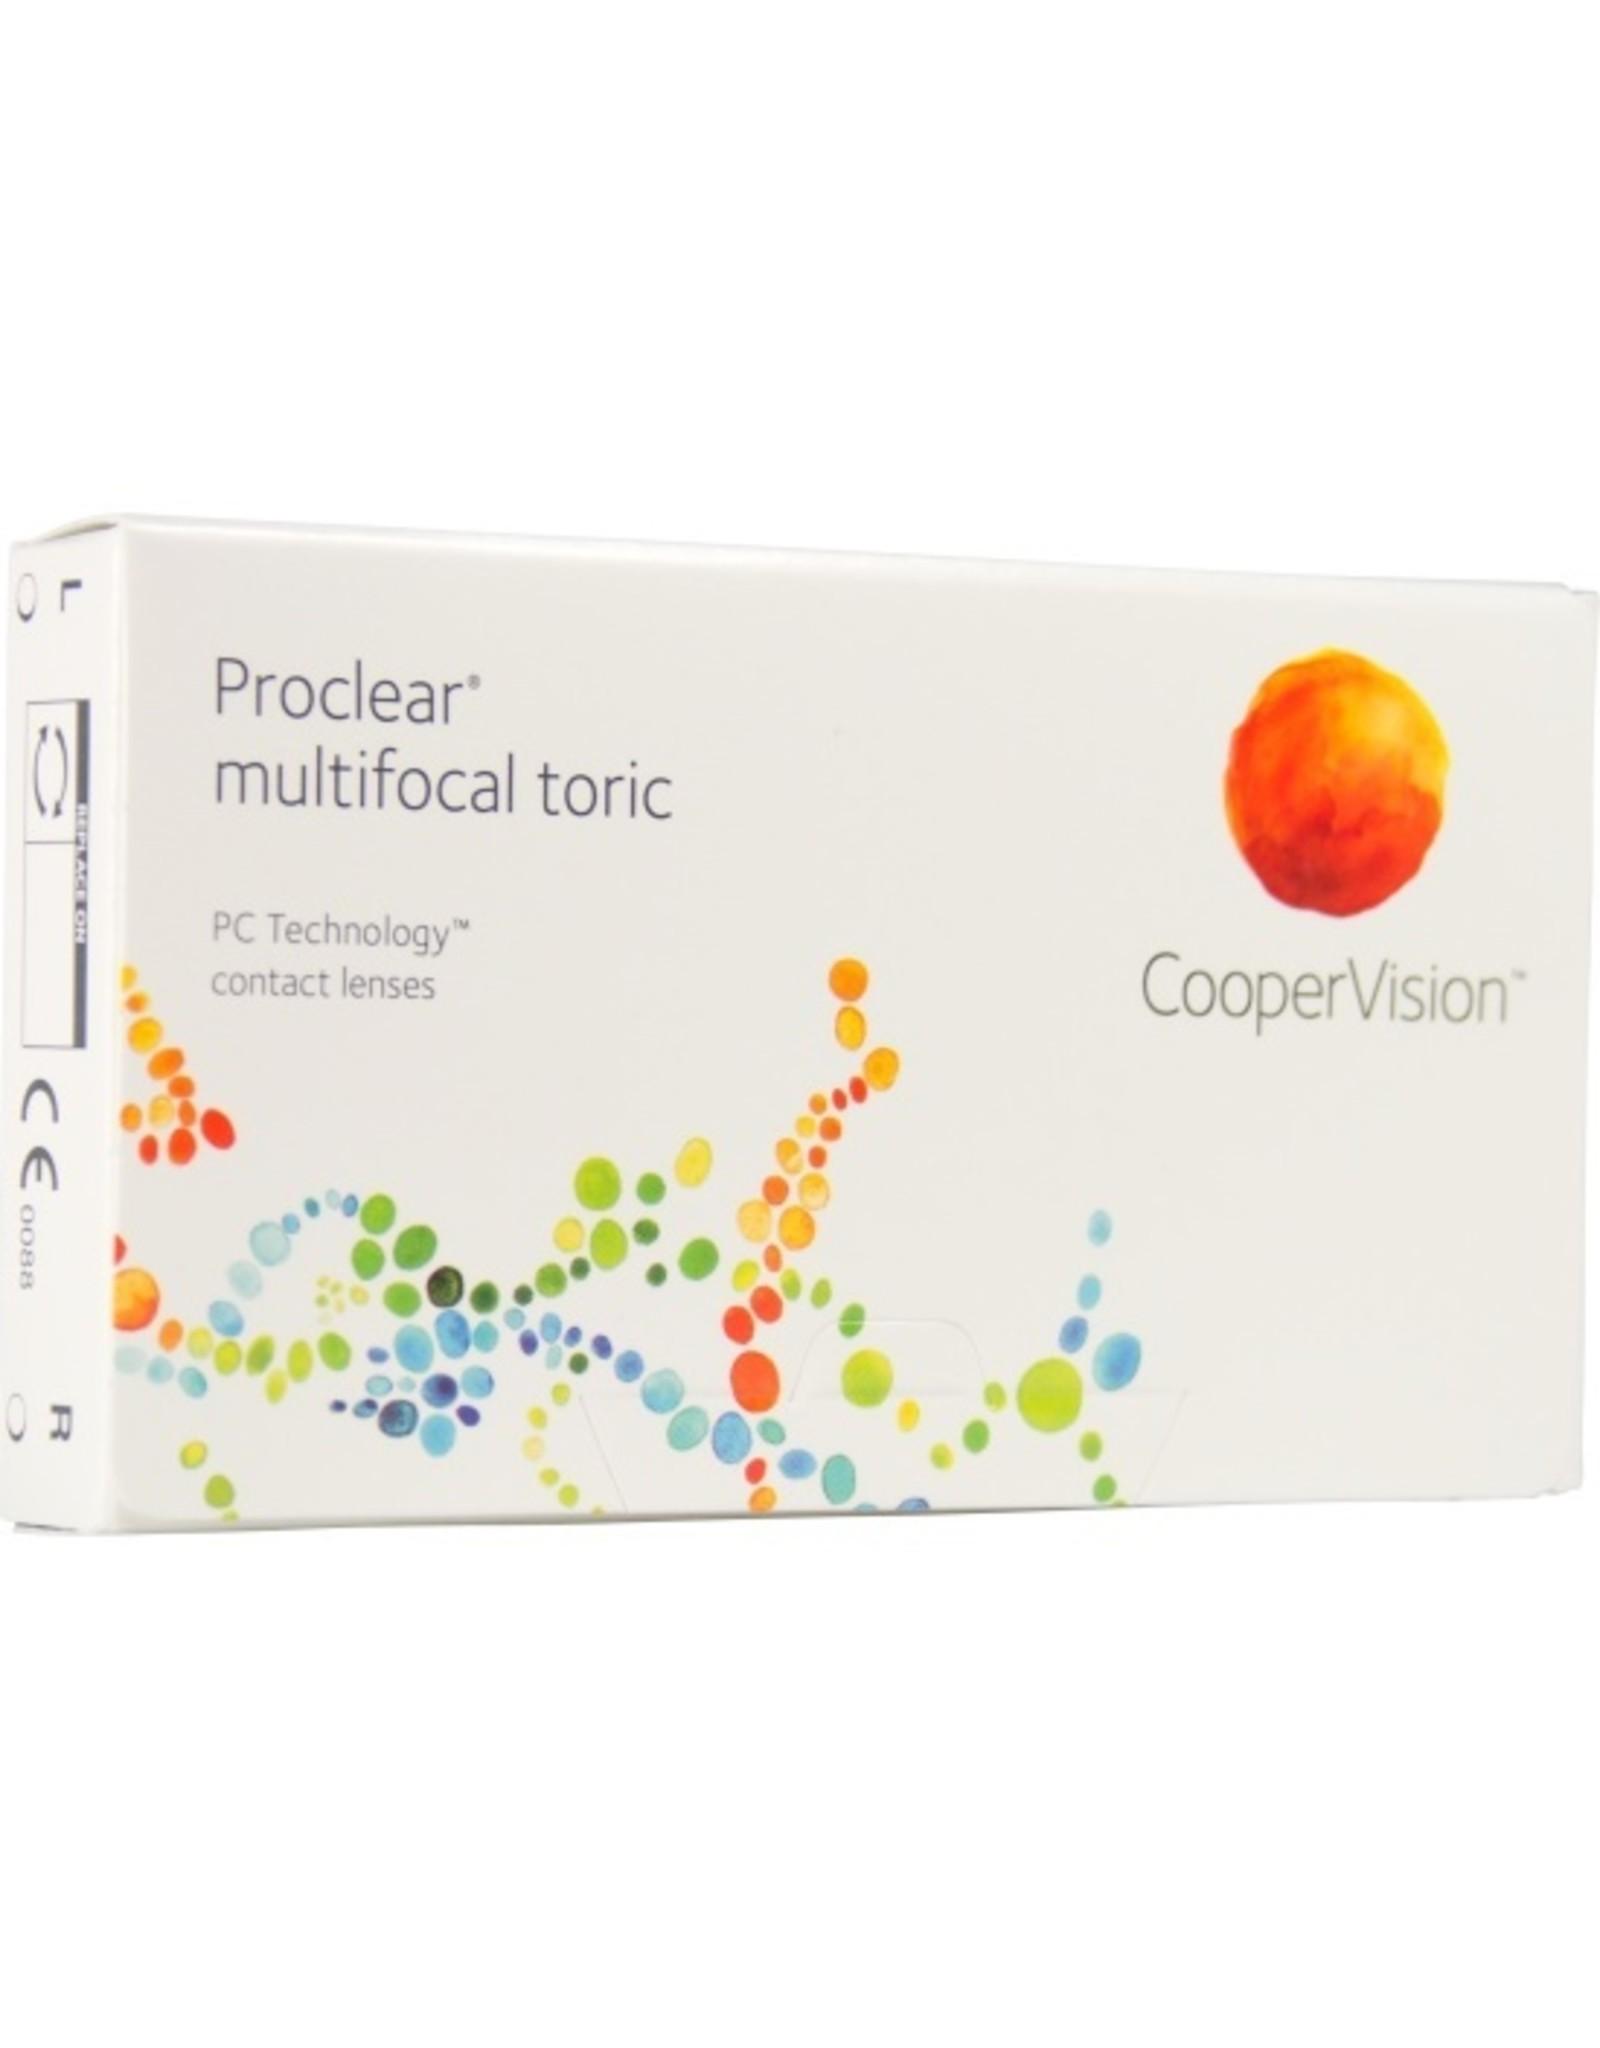 Proclear Multifocal Toric XR 6er Box